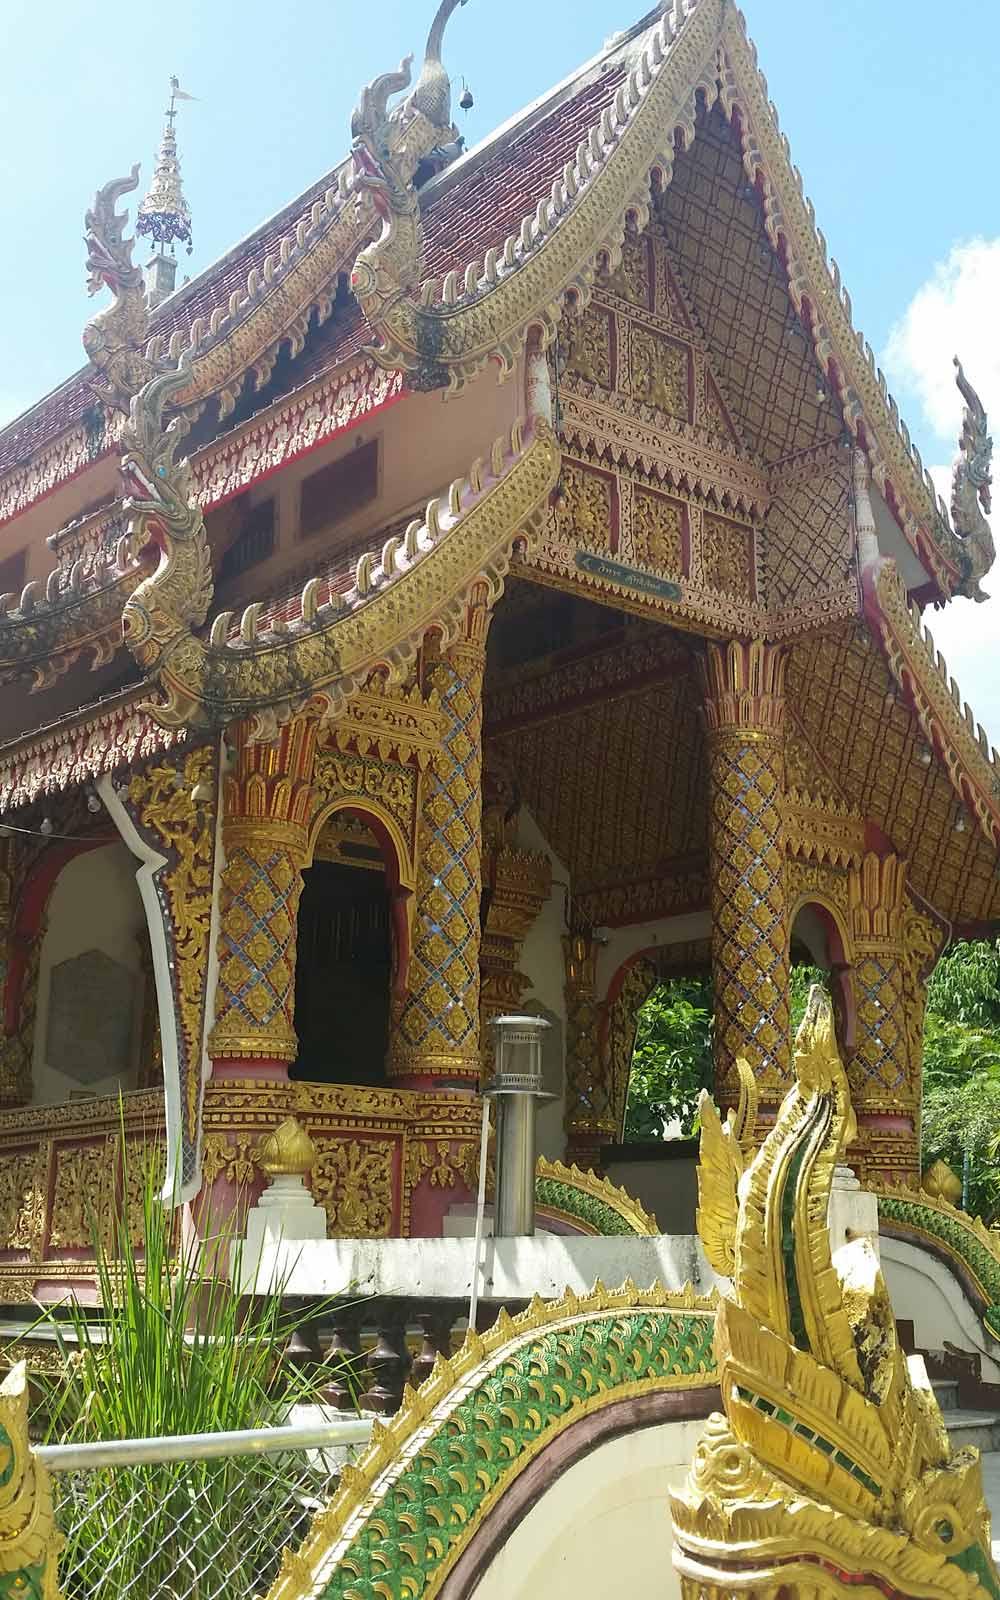 Tempel mit Wunschbrunnen in Lampang, Thailand